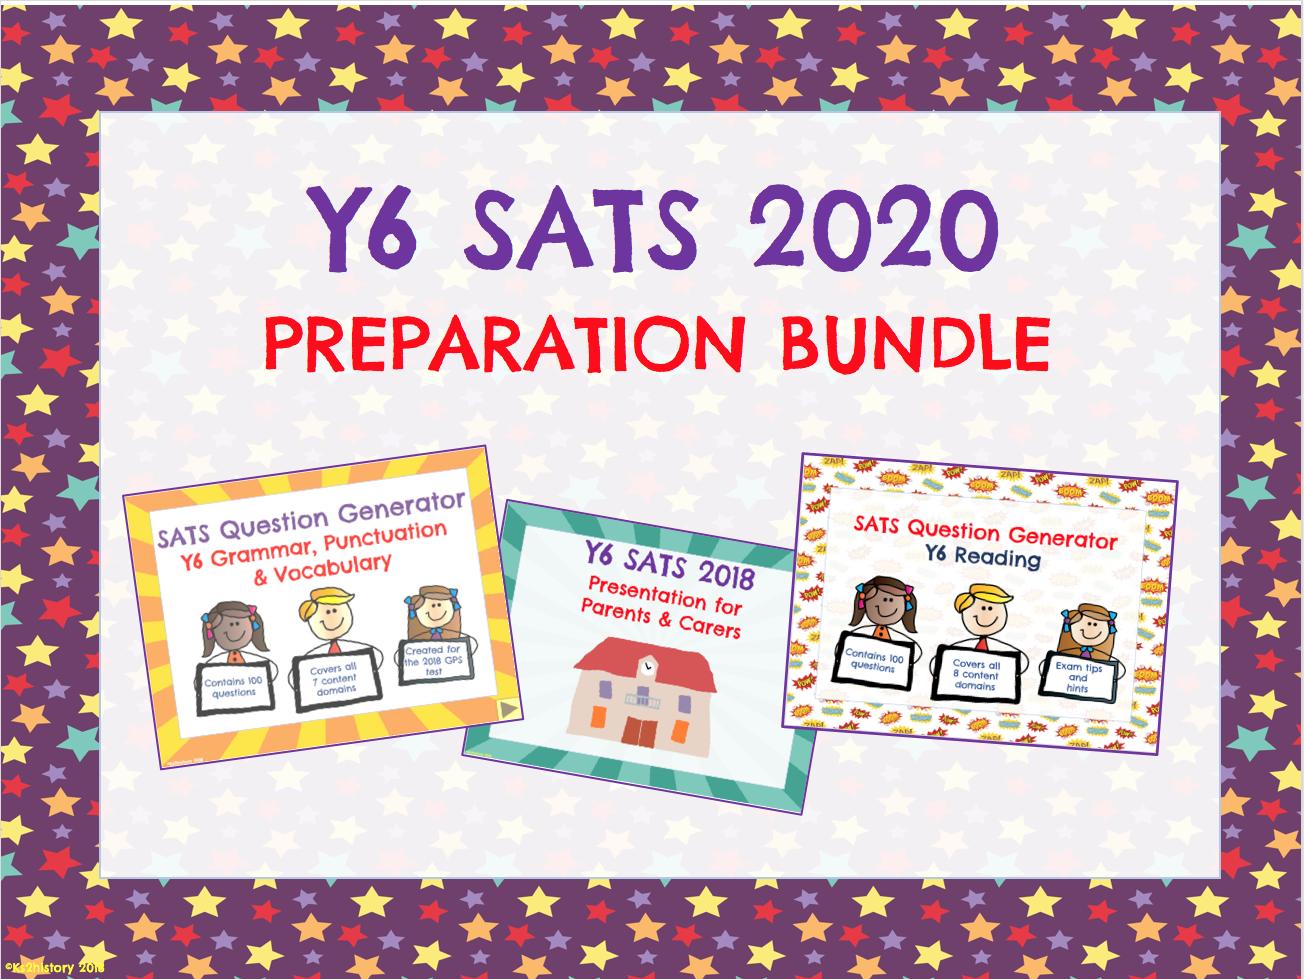 SATS Preparation 2020